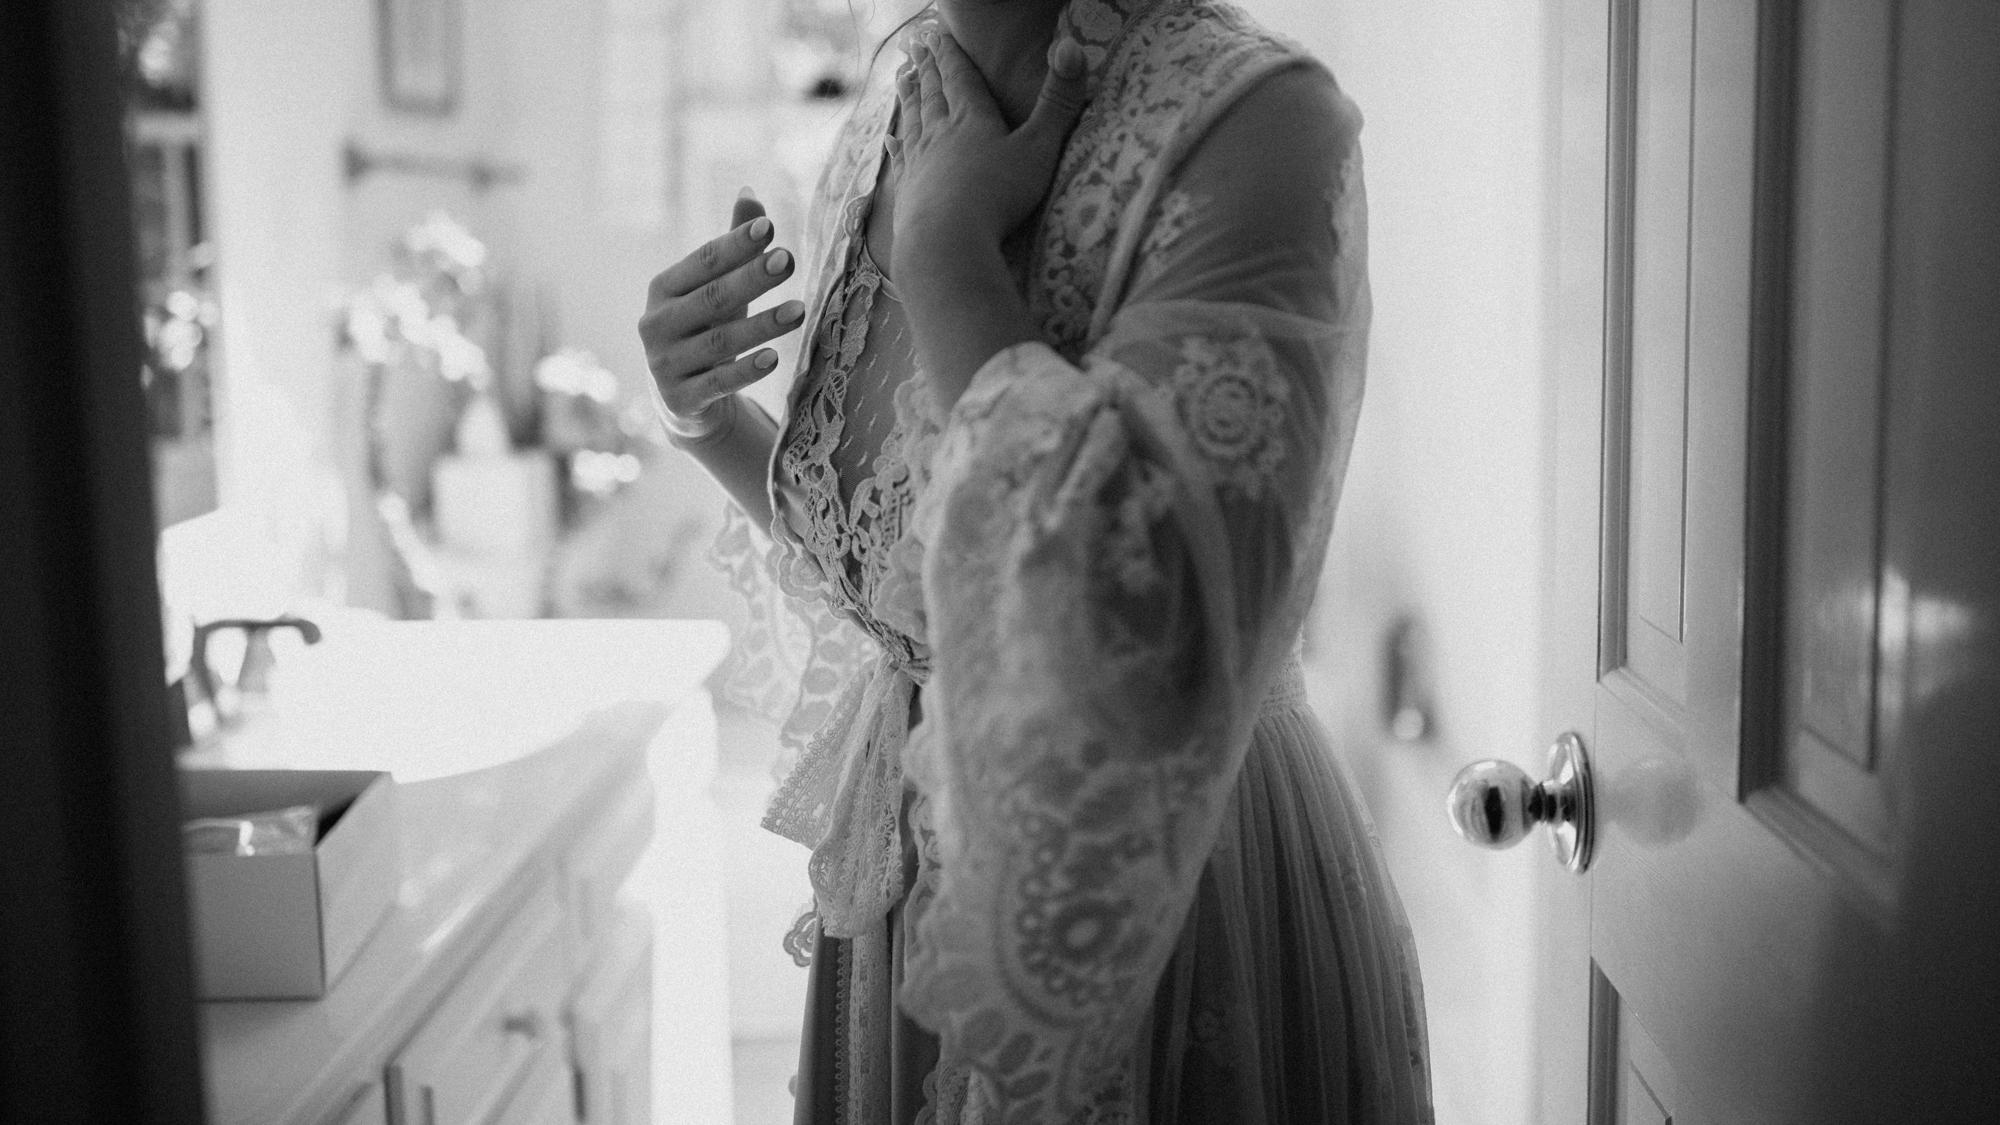 alec_vanderboom_kansas_city_mo_wedding_photos-0019.jpg